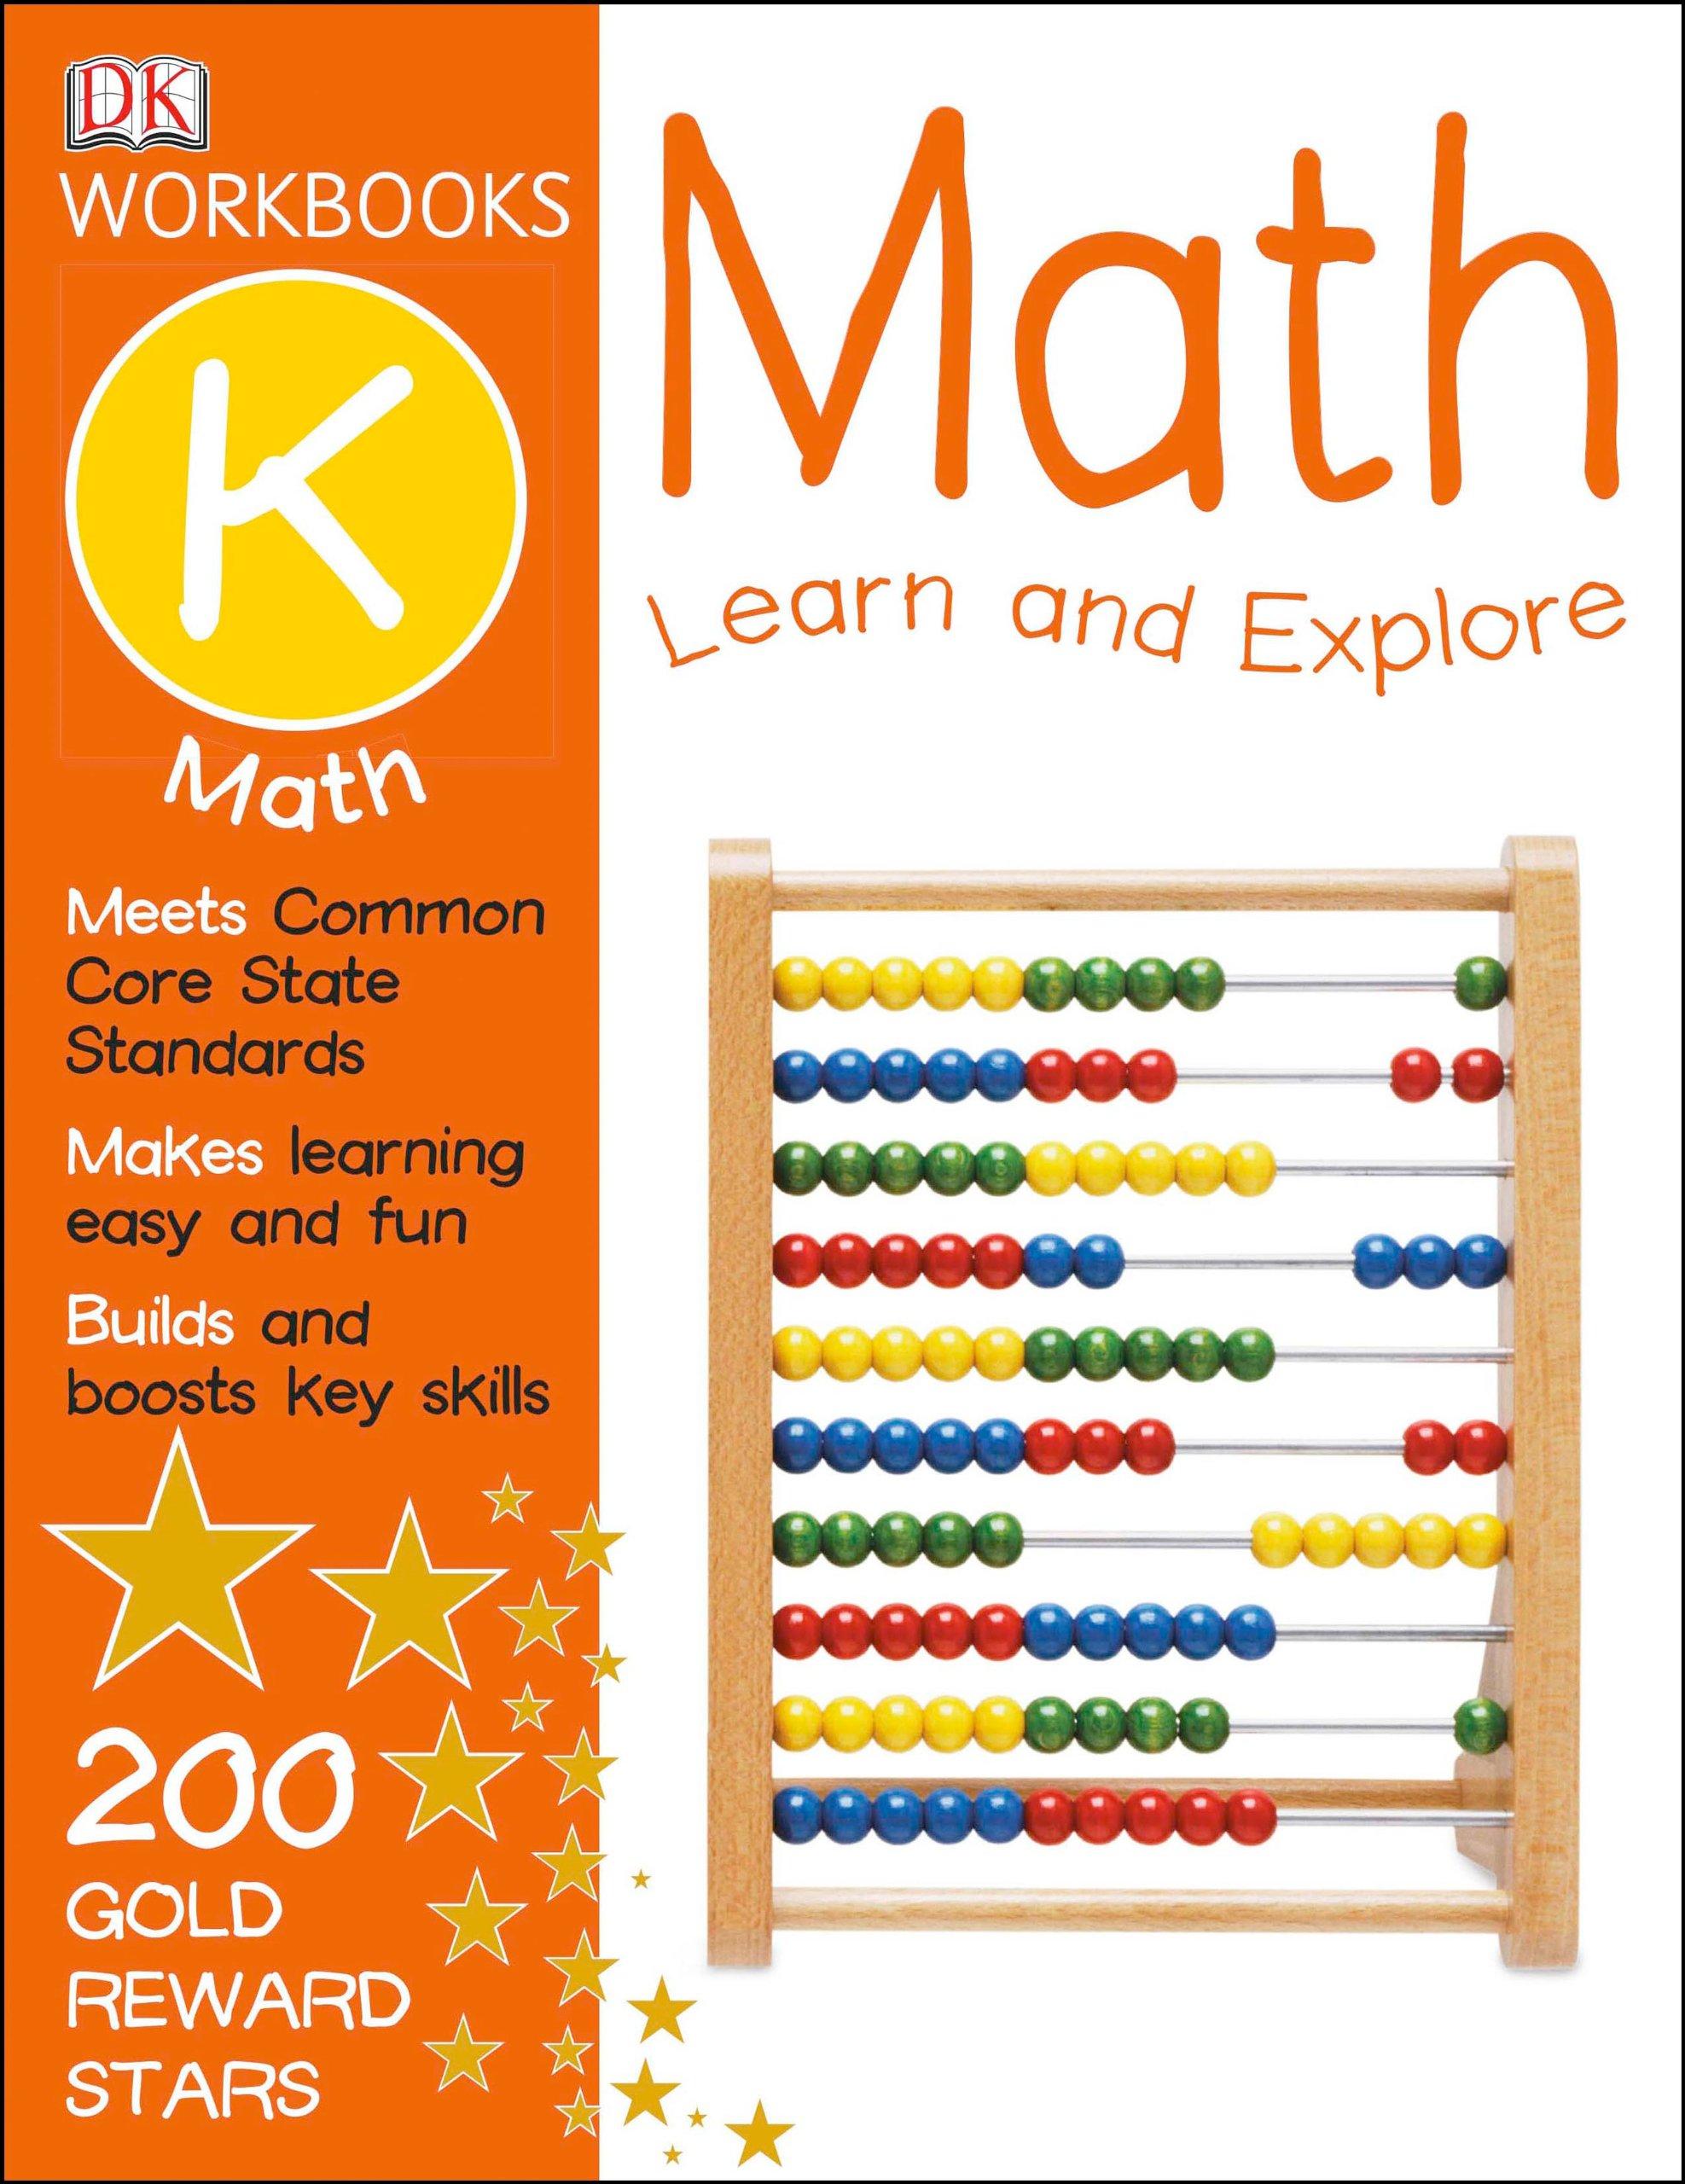 DK Workbooks: Math, Kindergarten: DK Publishing: 0790778017323 ...